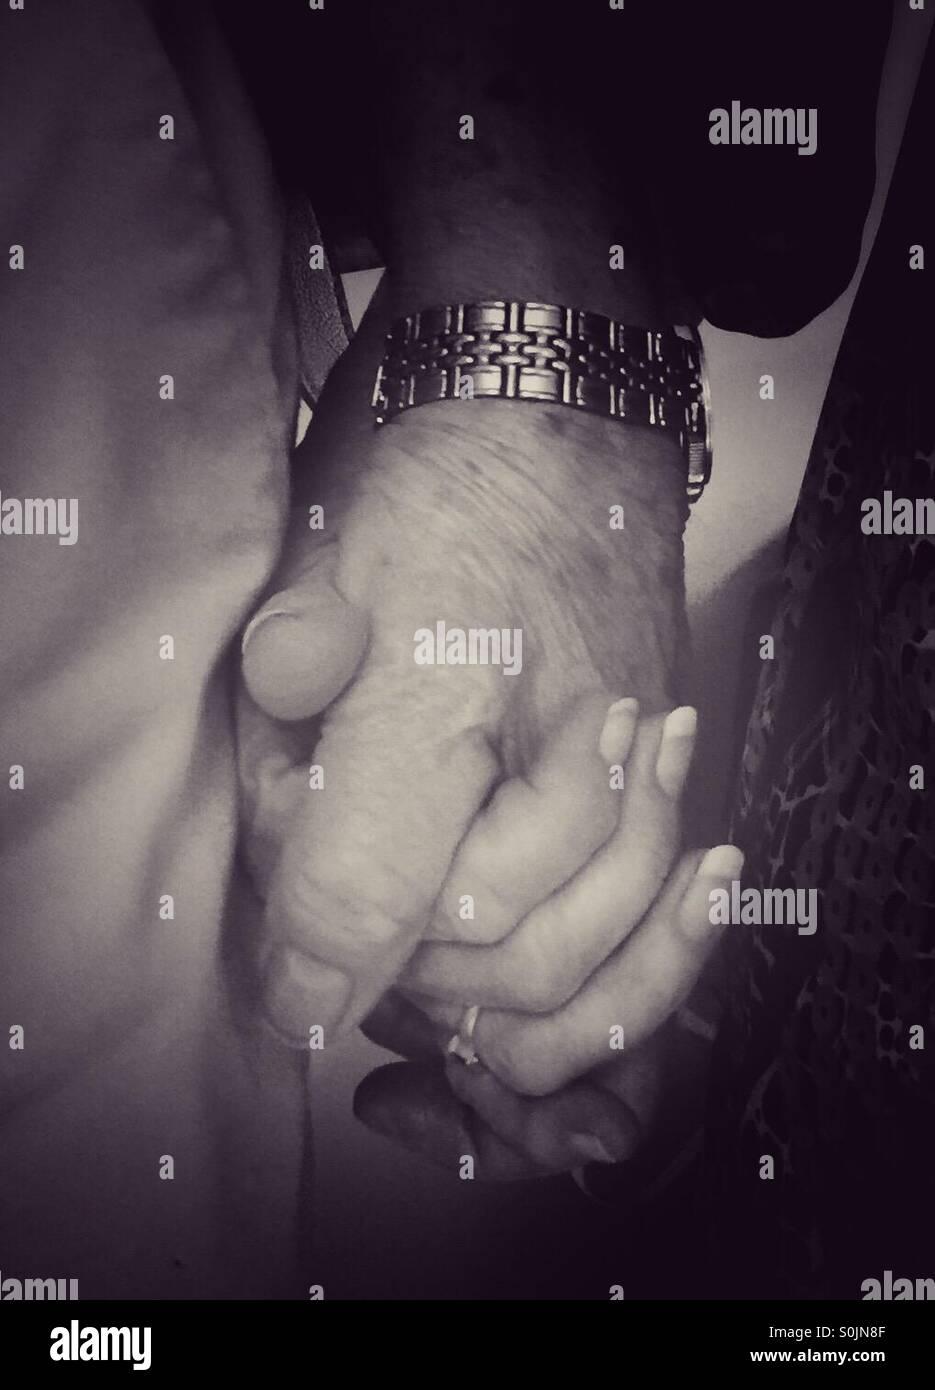 Loving Hands - Stock Image